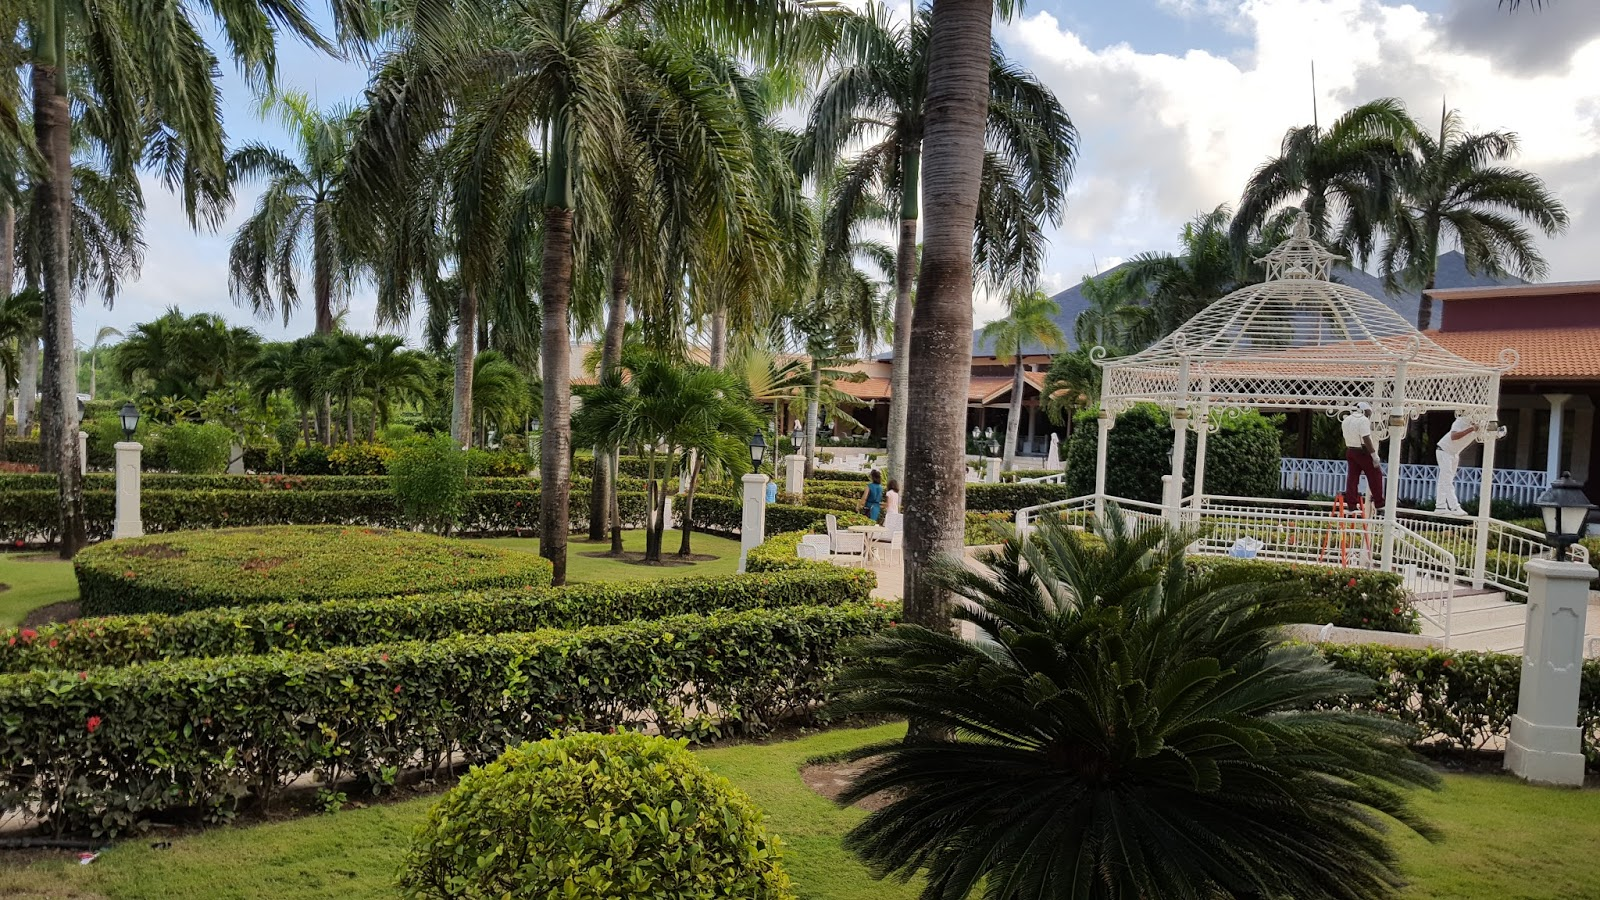 Dominikana hotel bahia principe punta cana